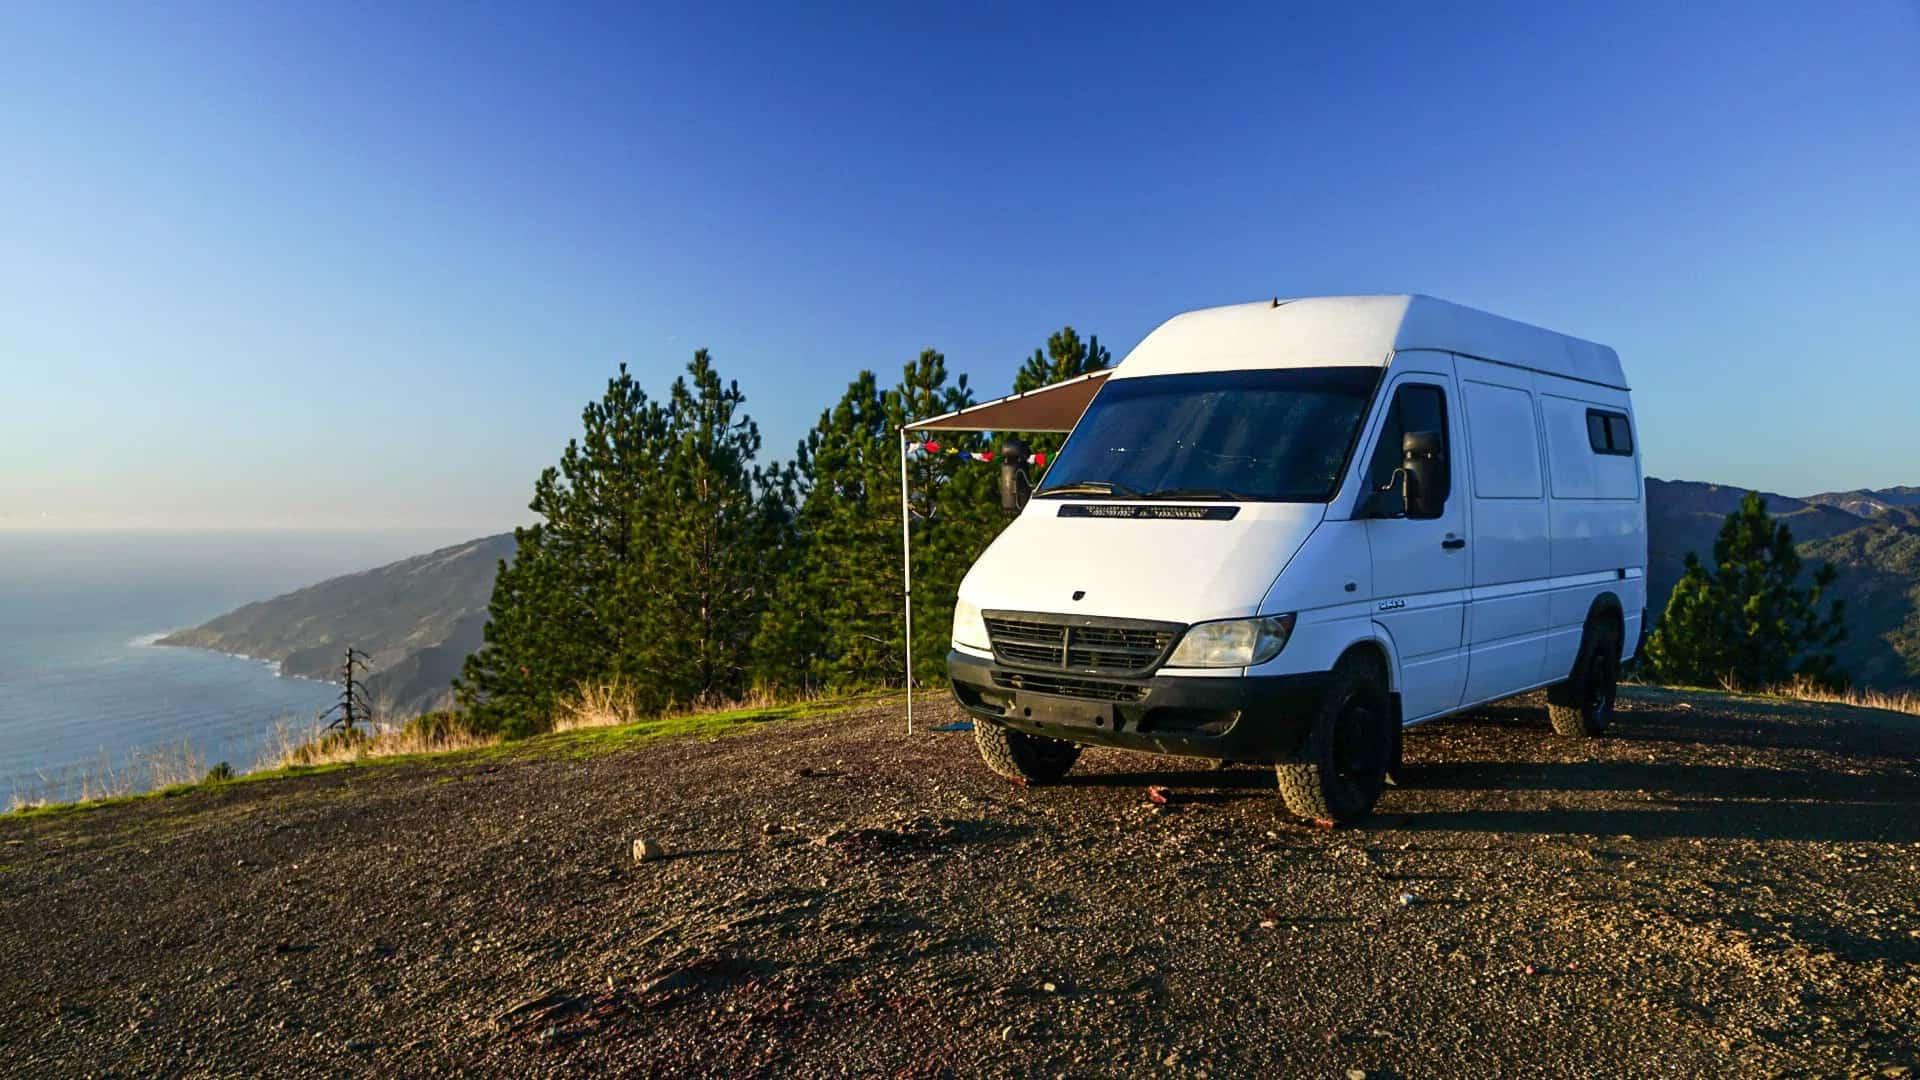 Como ser ecologico viviendo en furgoneta o RV 1